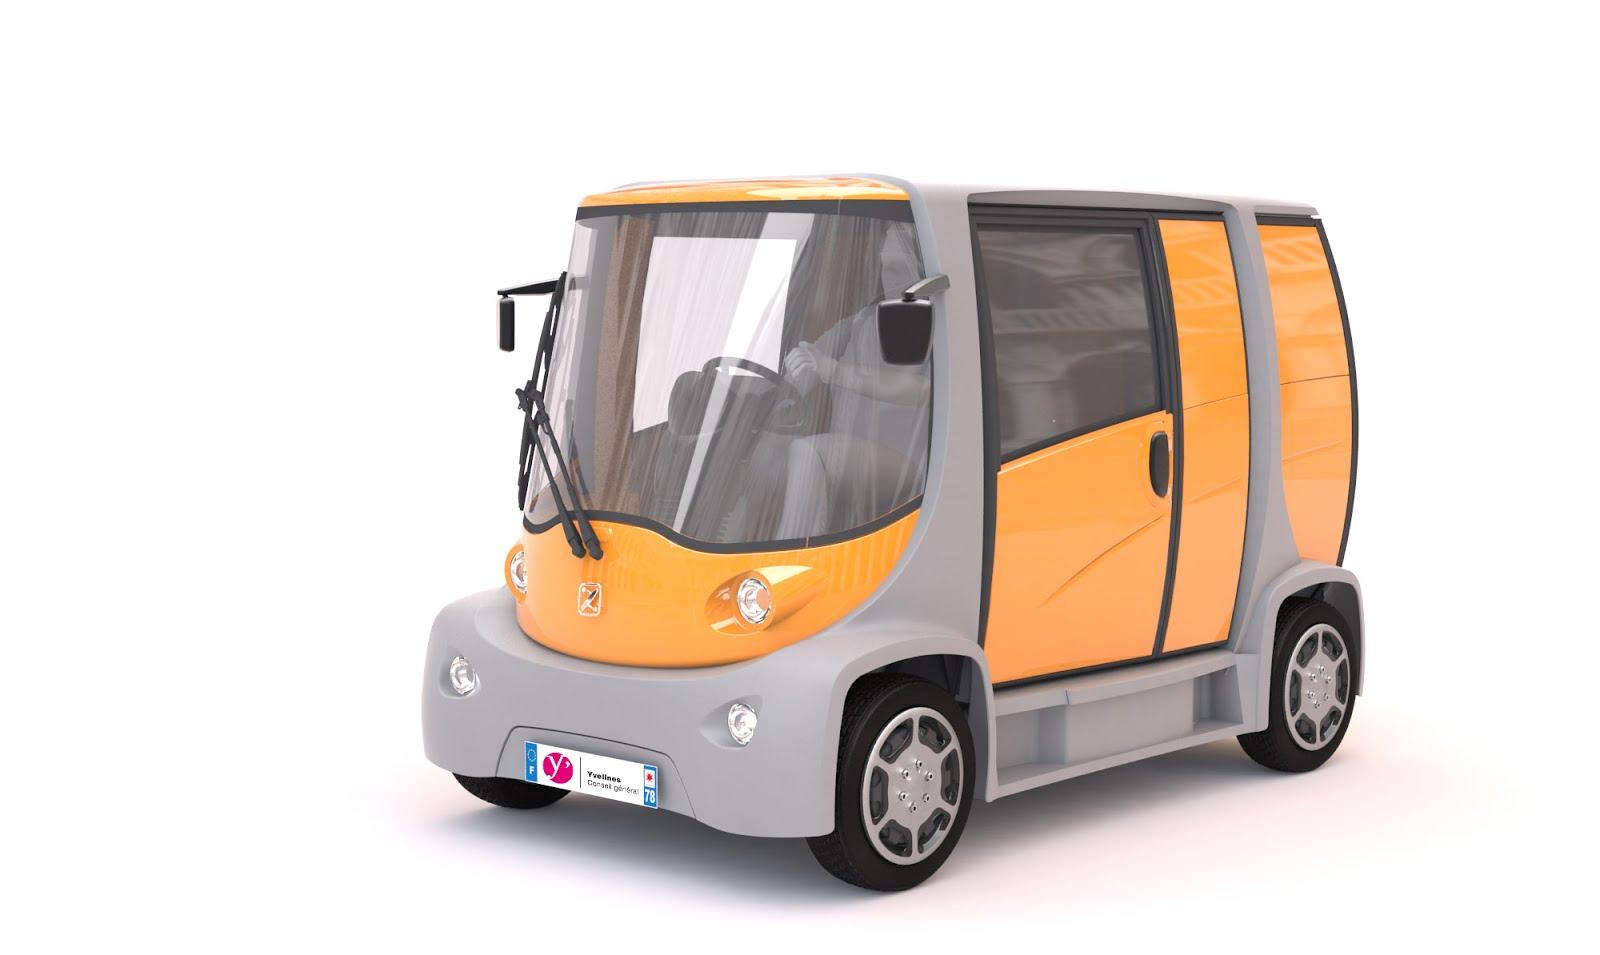 voiture du futur des v hicules lectriques innovants made in yvelines voir au salon de gen ve. Black Bedroom Furniture Sets. Home Design Ideas